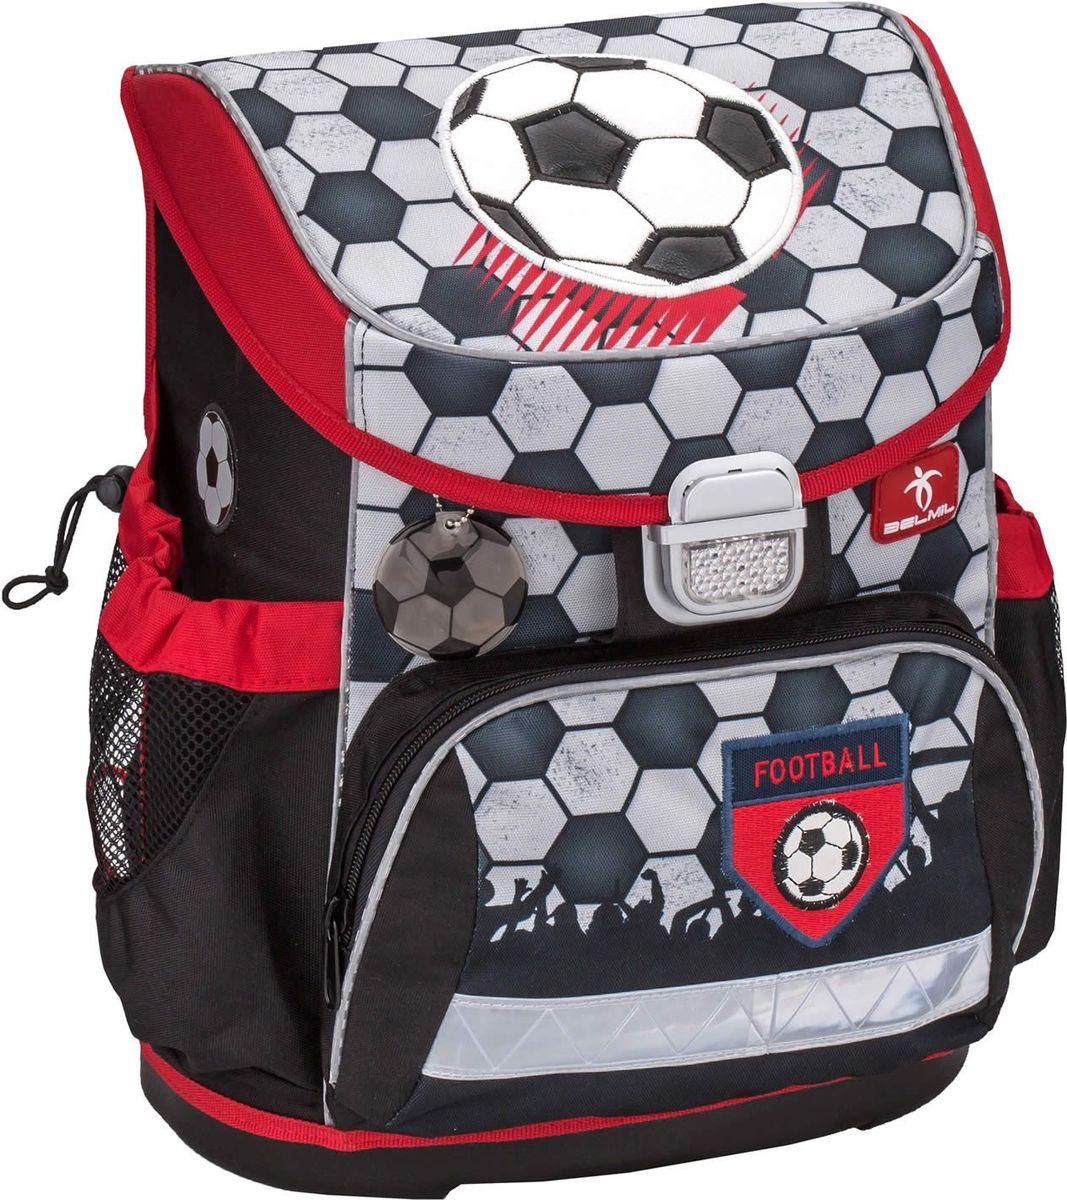 Belmil Ранец школьный Mini-Fit Football405-33/510